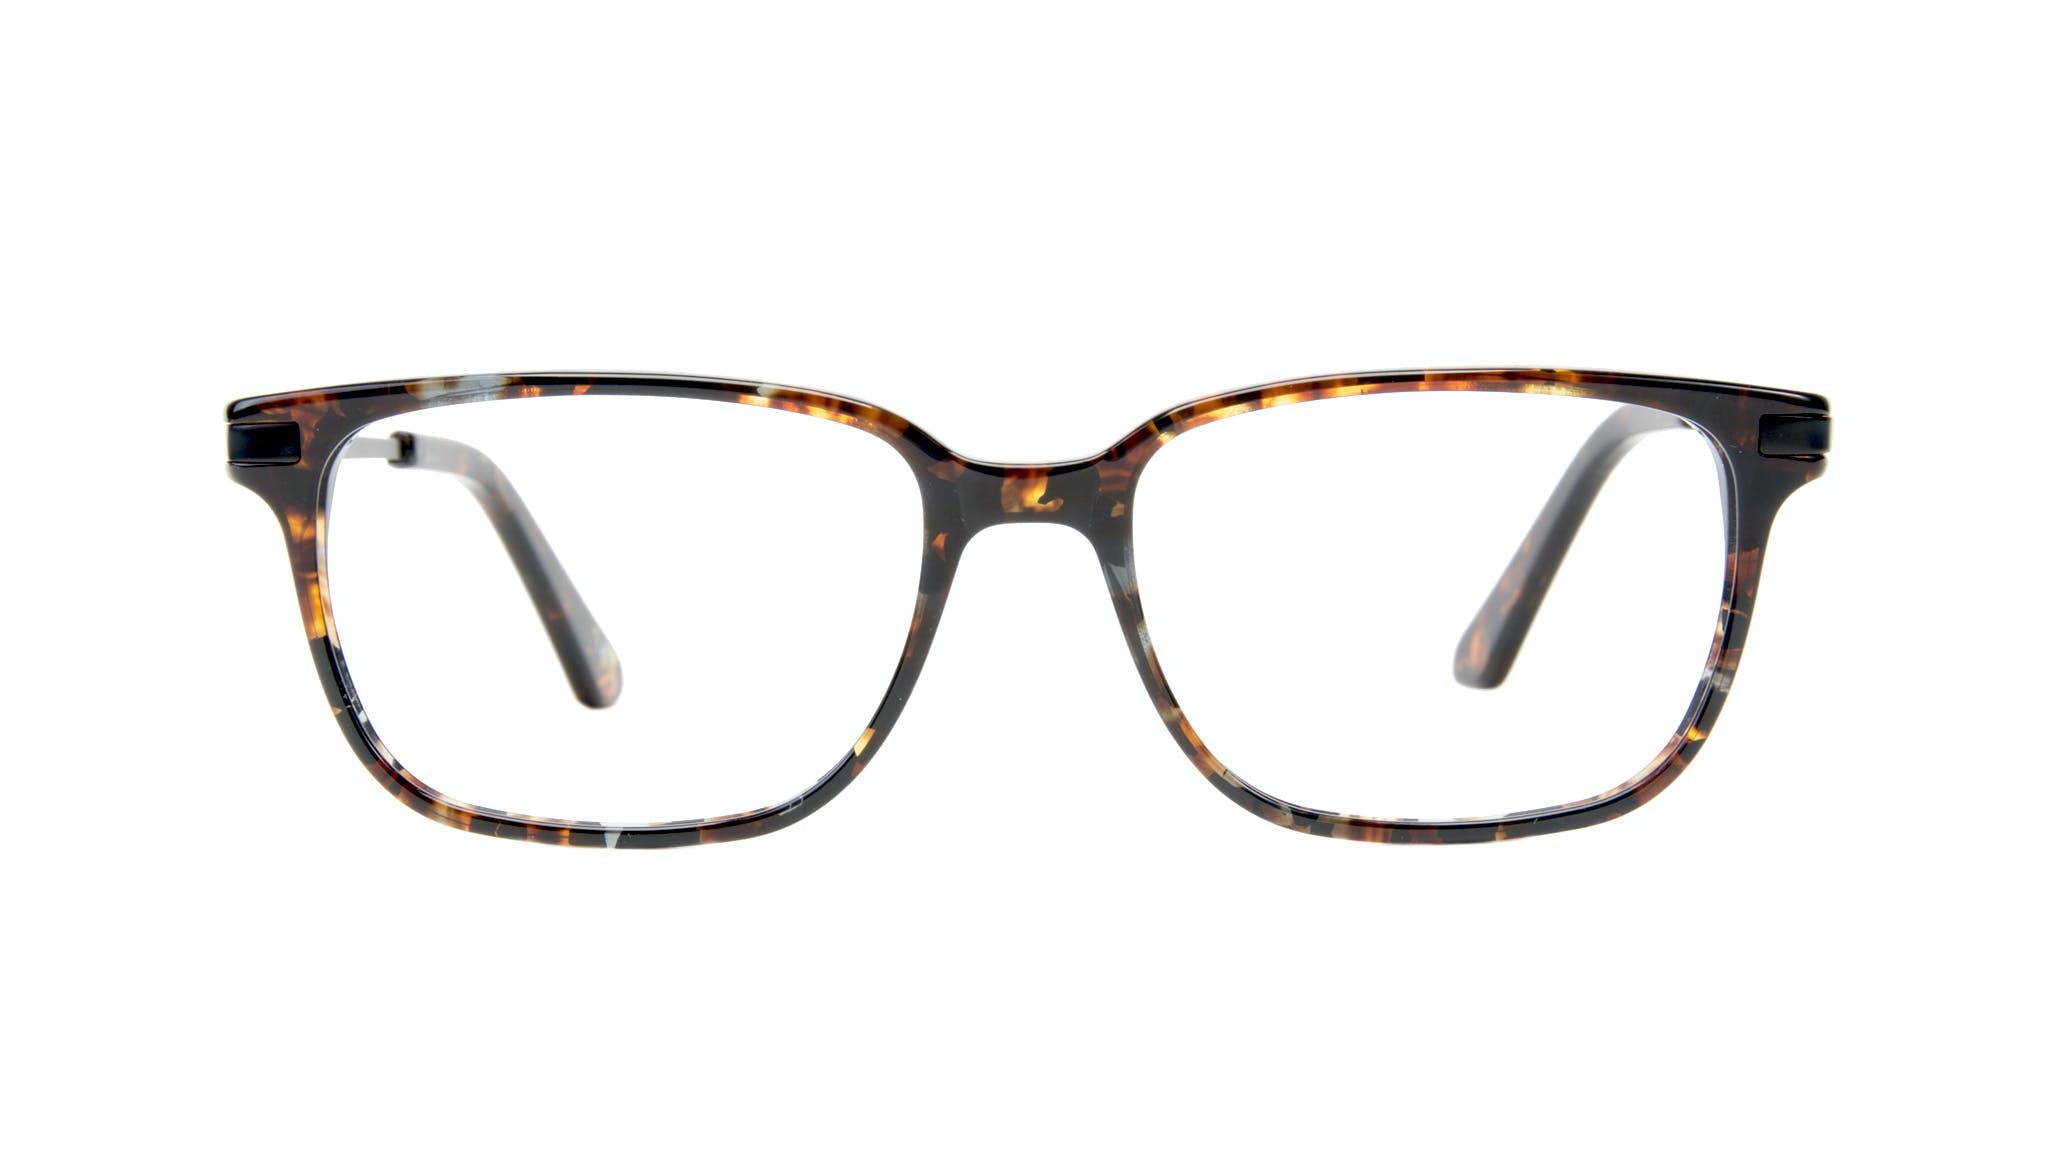 Affordable Fashion Glasses Rectangle Eyeglasses Men Trade Mahogany Front